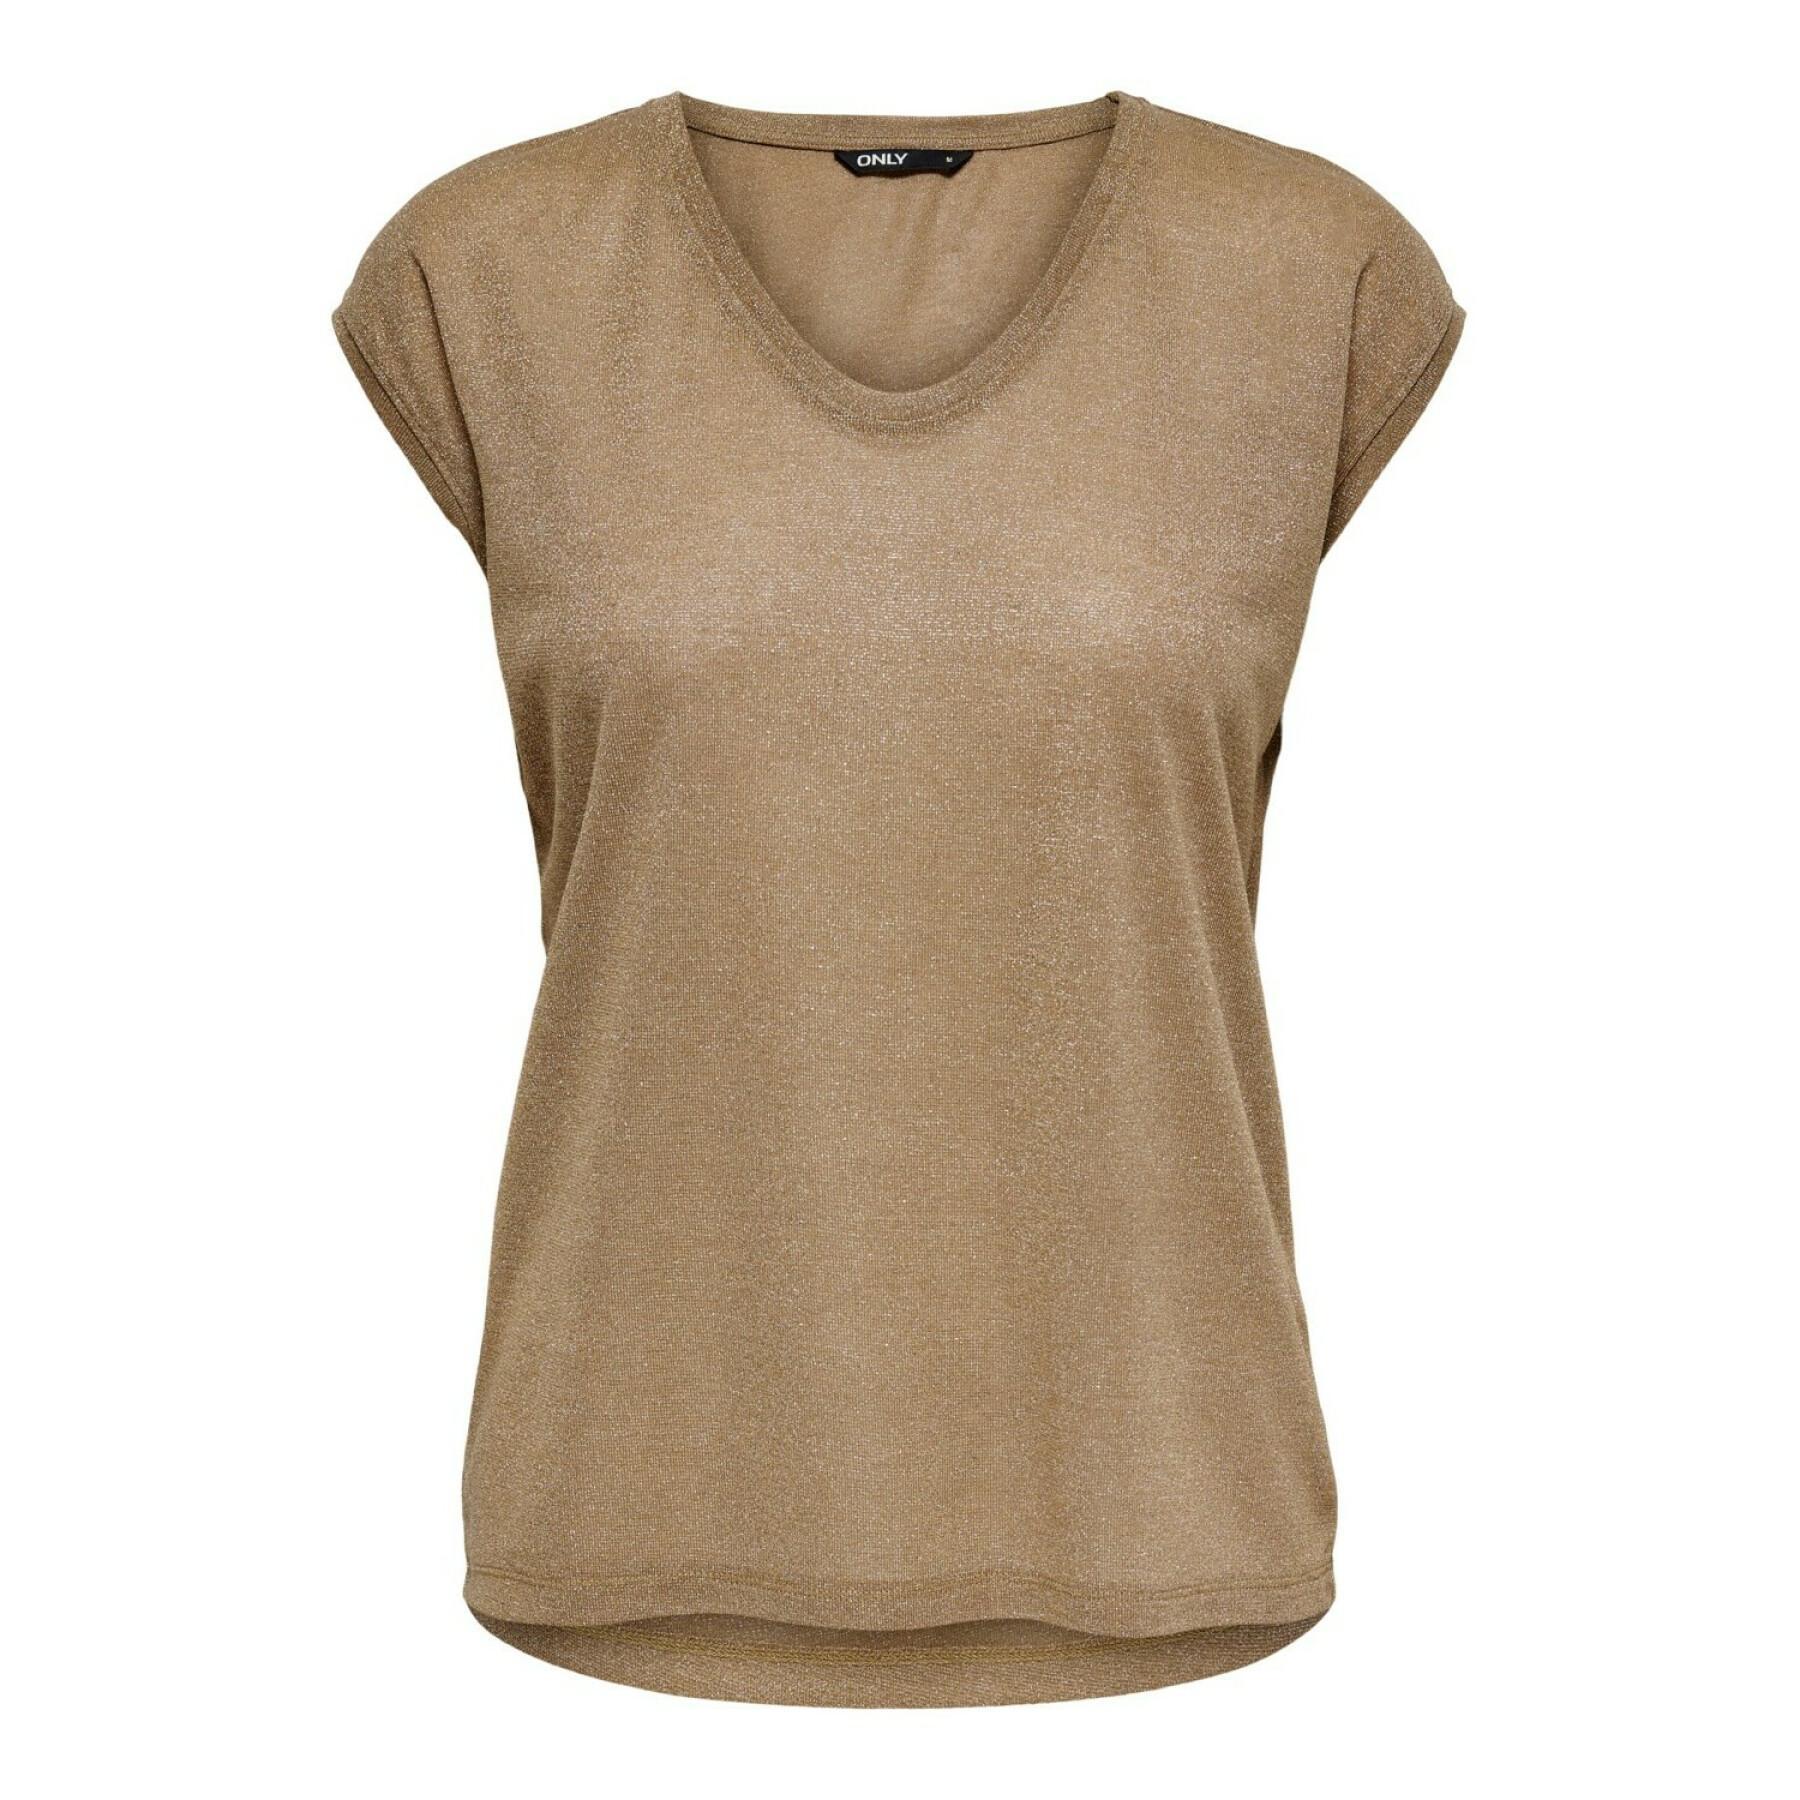 Women's T-shirt Only onlsilvery